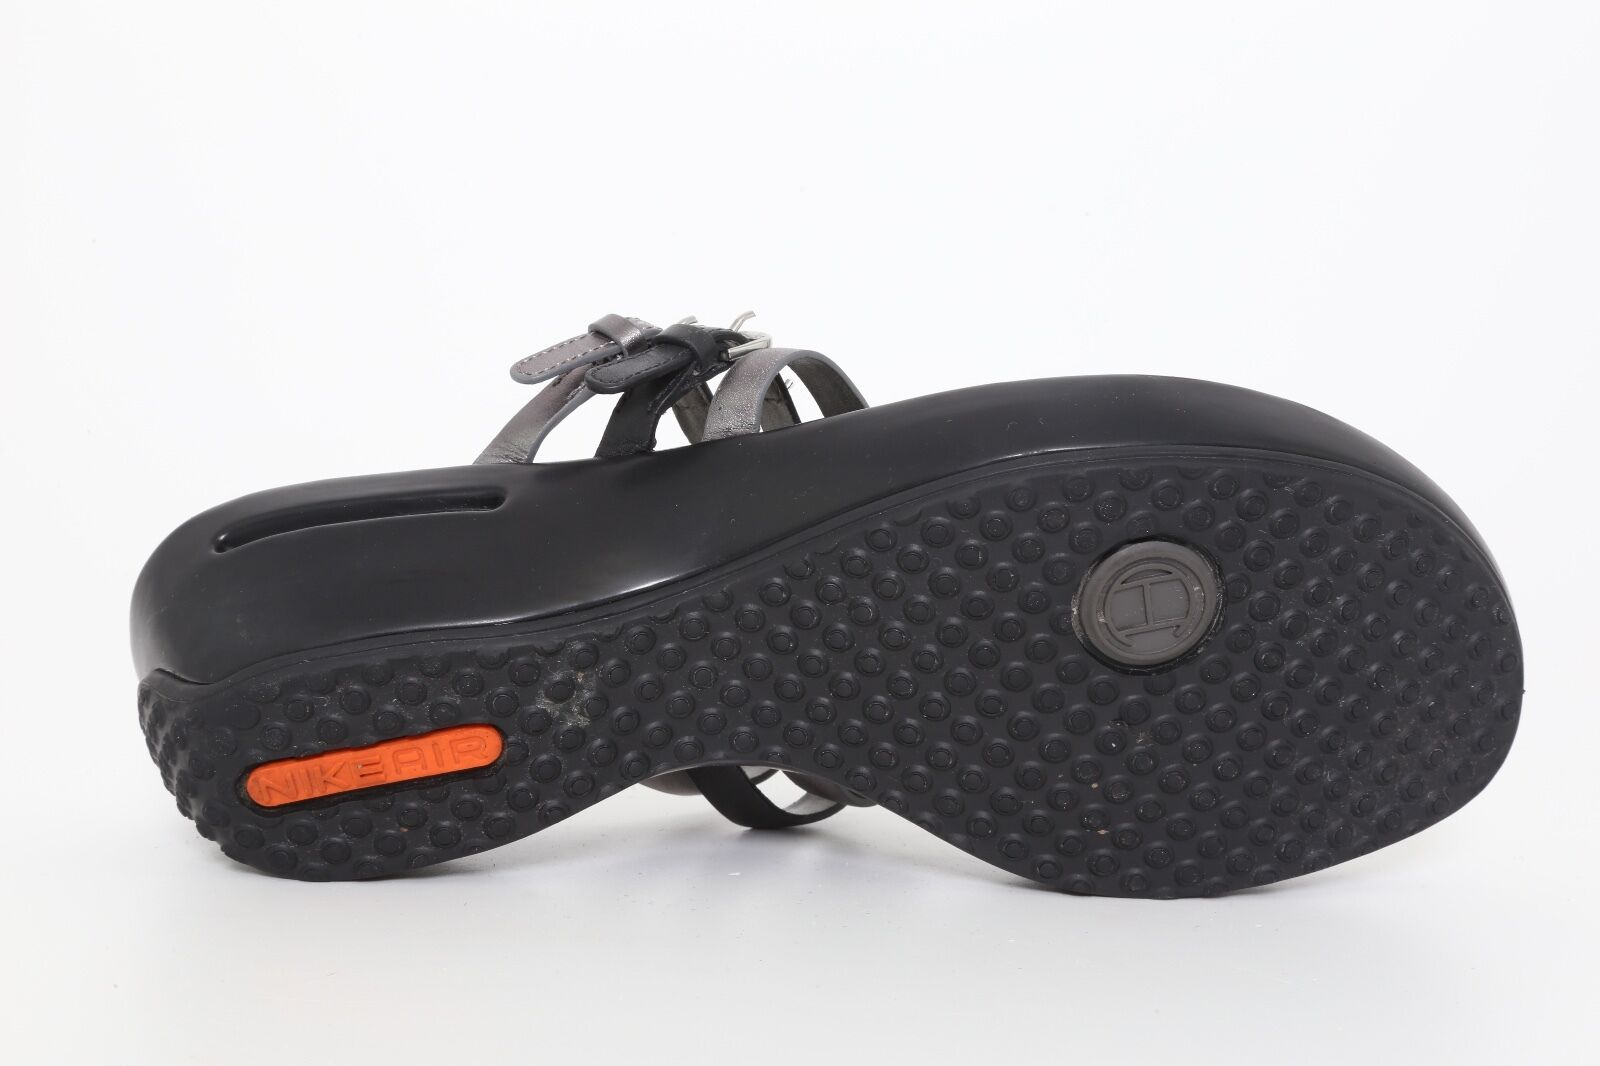 Cole Haan Donna  Leather Air Melisa Thong Sandal Sandal Sandal Gunsmoke Metallic 4058 Sz 9.5B e70f1a